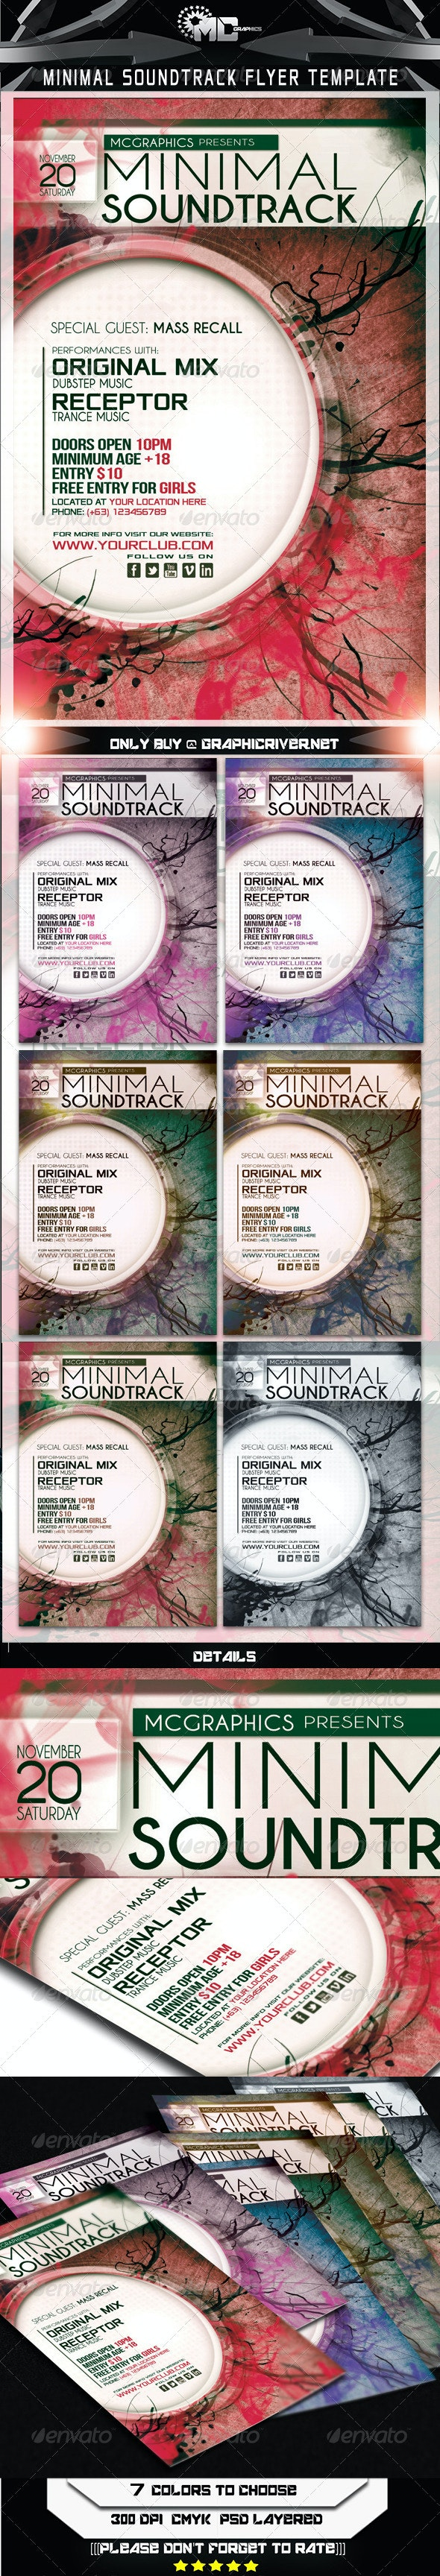 Minimal Soundtrack Flyer Template - Events Flyers